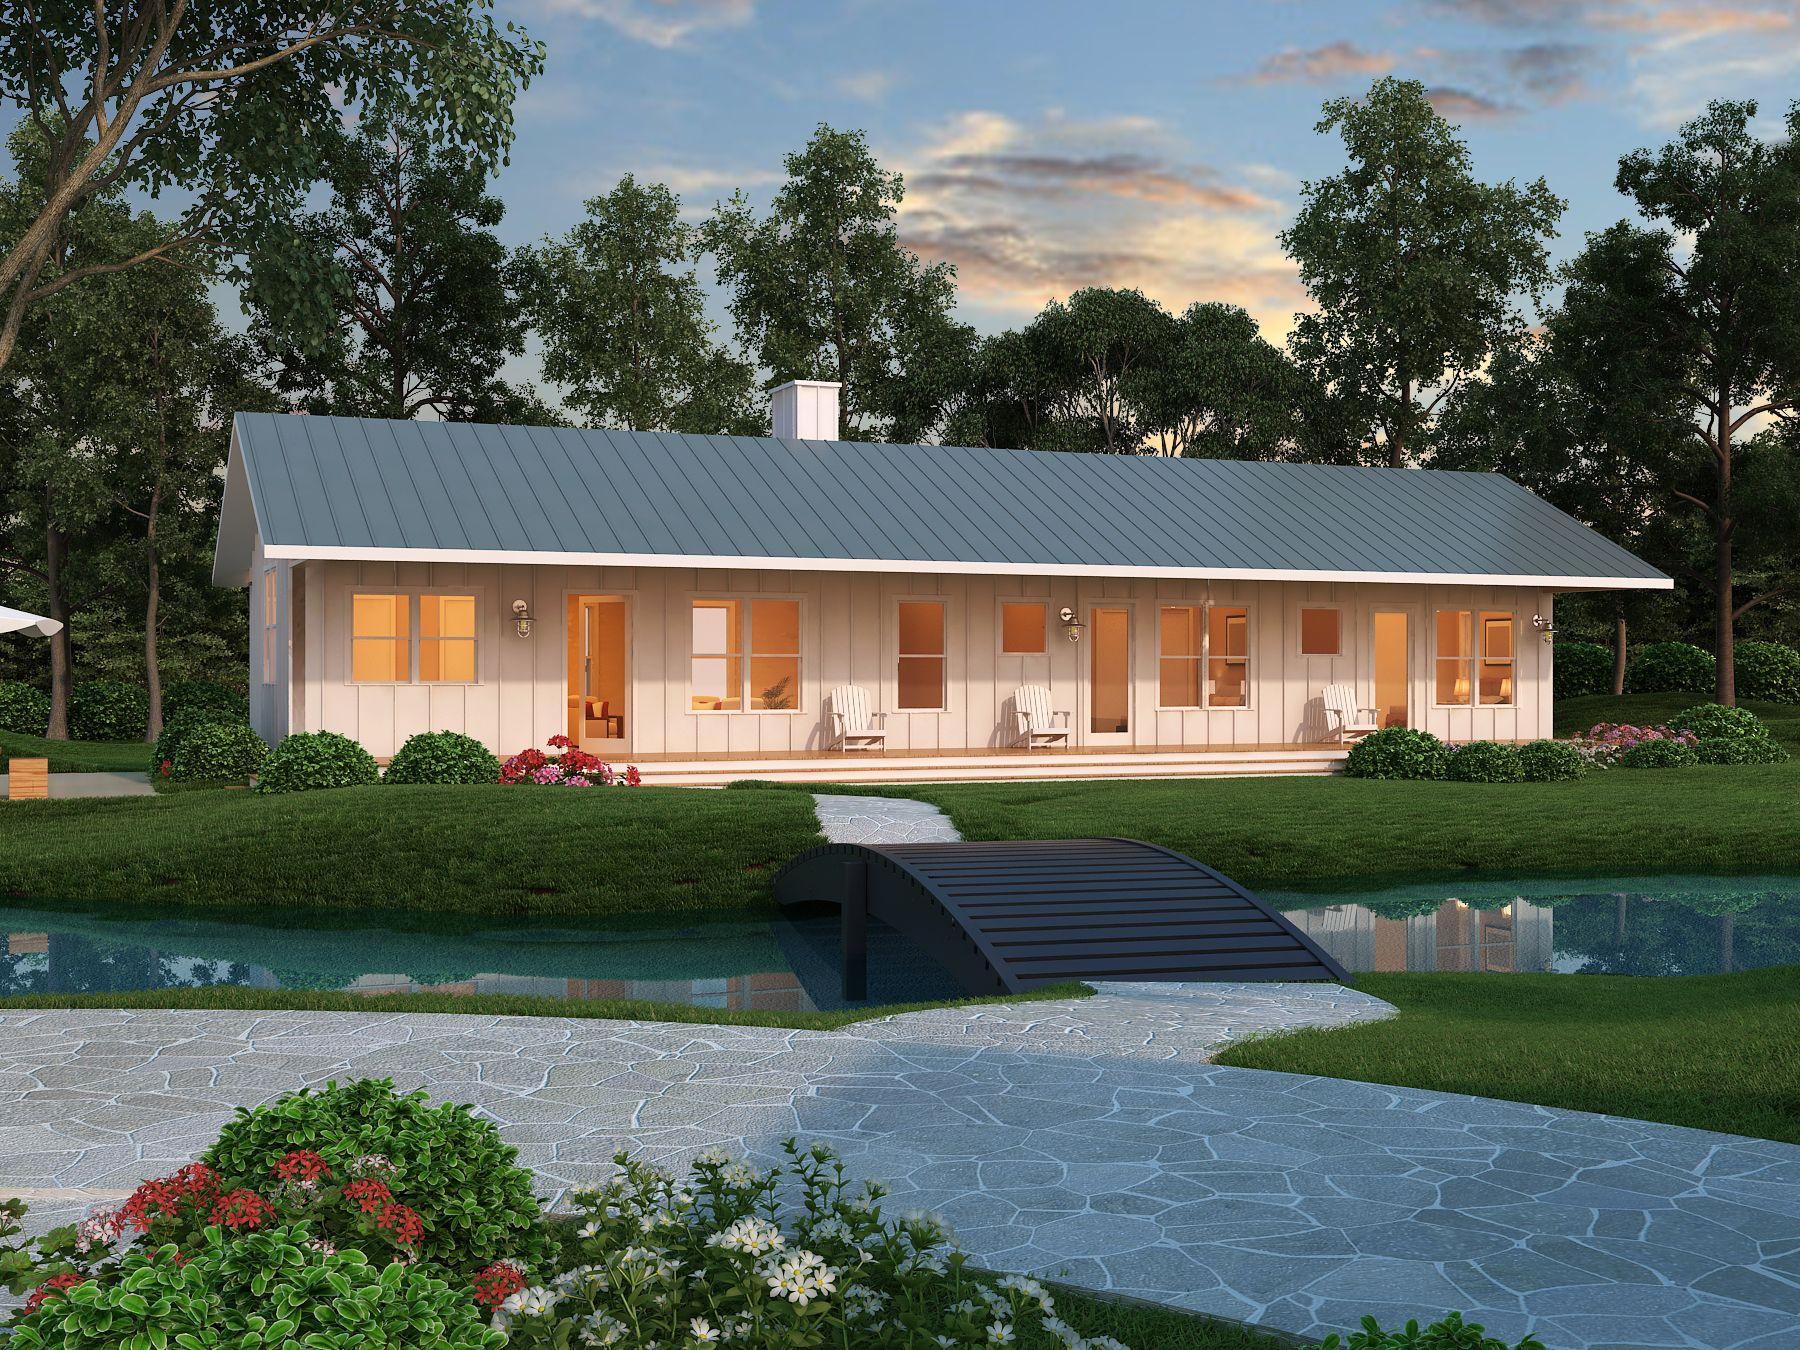 Farmhouse Style House Plan 3 Beds 2.5 Baths 2720 Sq/Ft